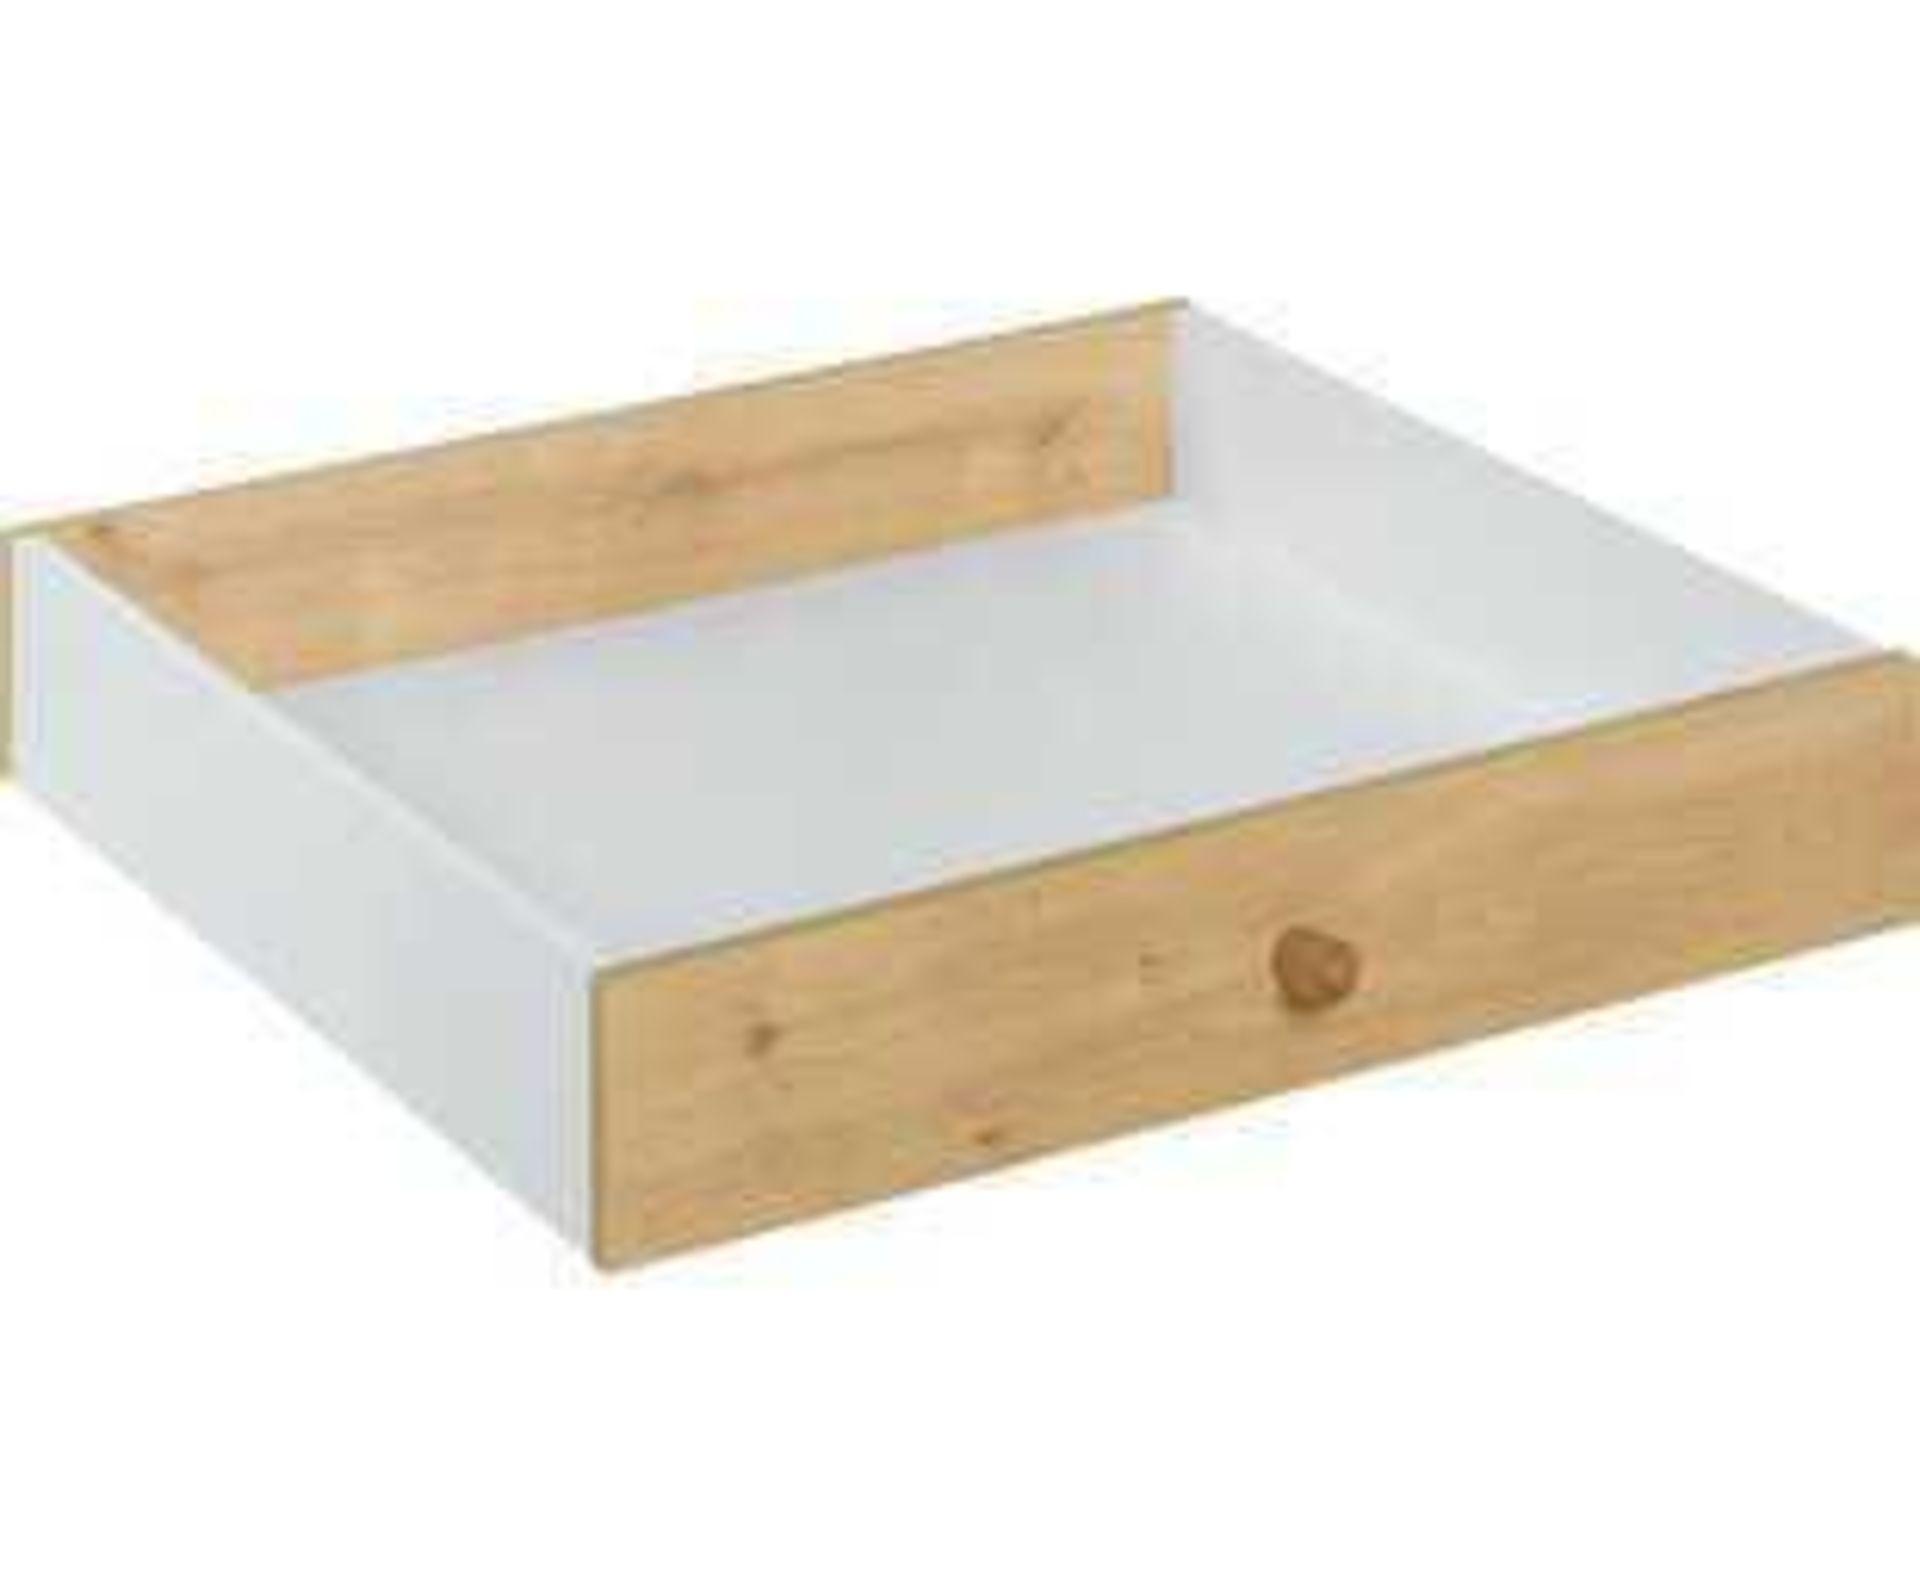 RRP £45 Boxed Halstead Desk Drawer